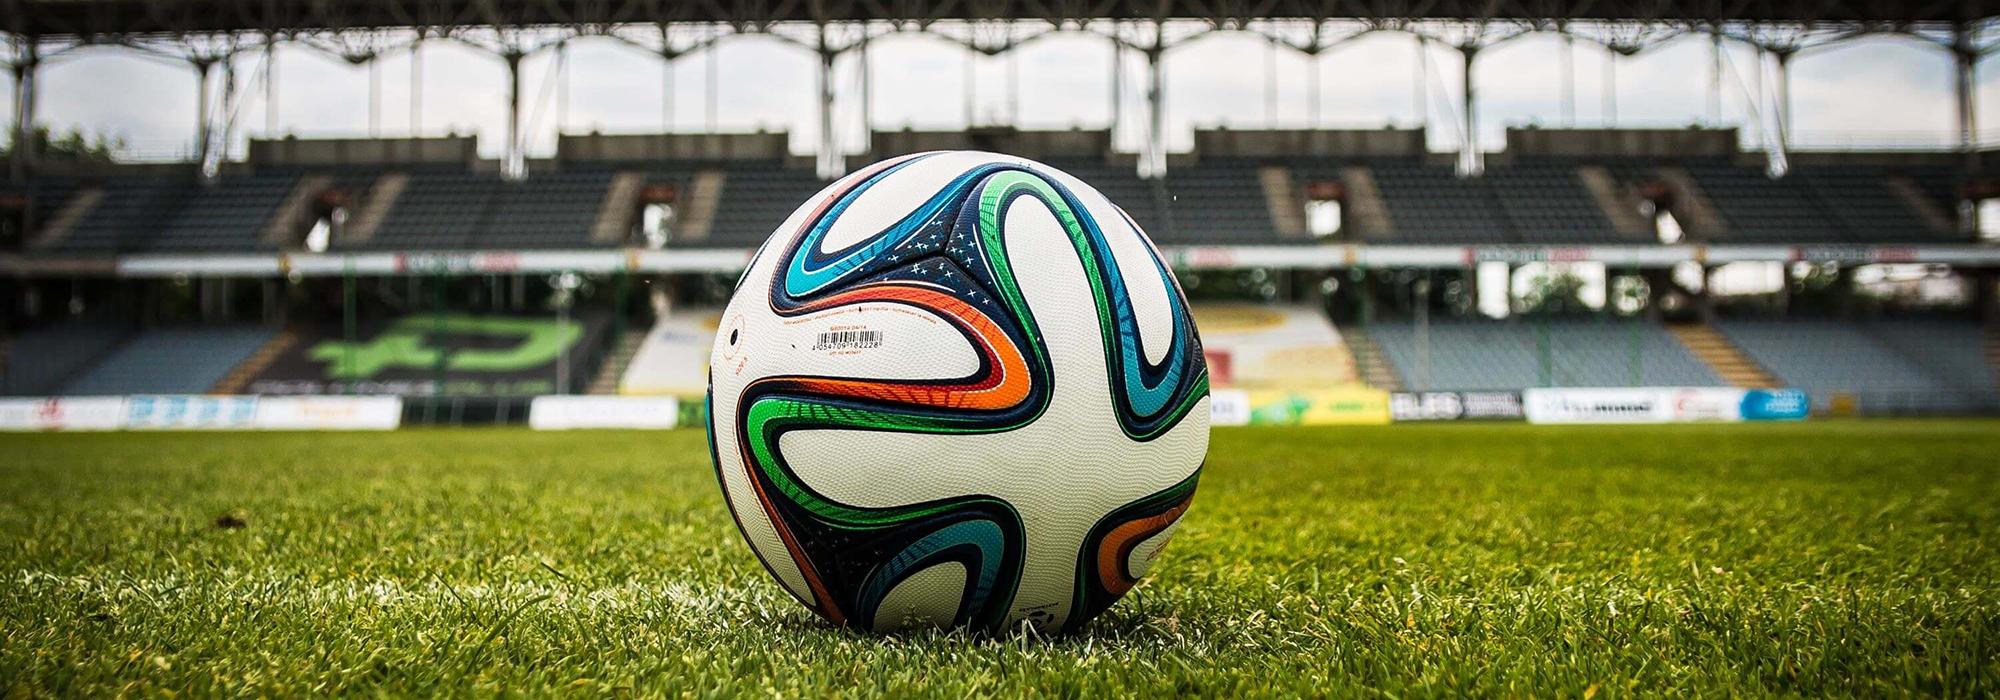 TS Football Tournament 2020